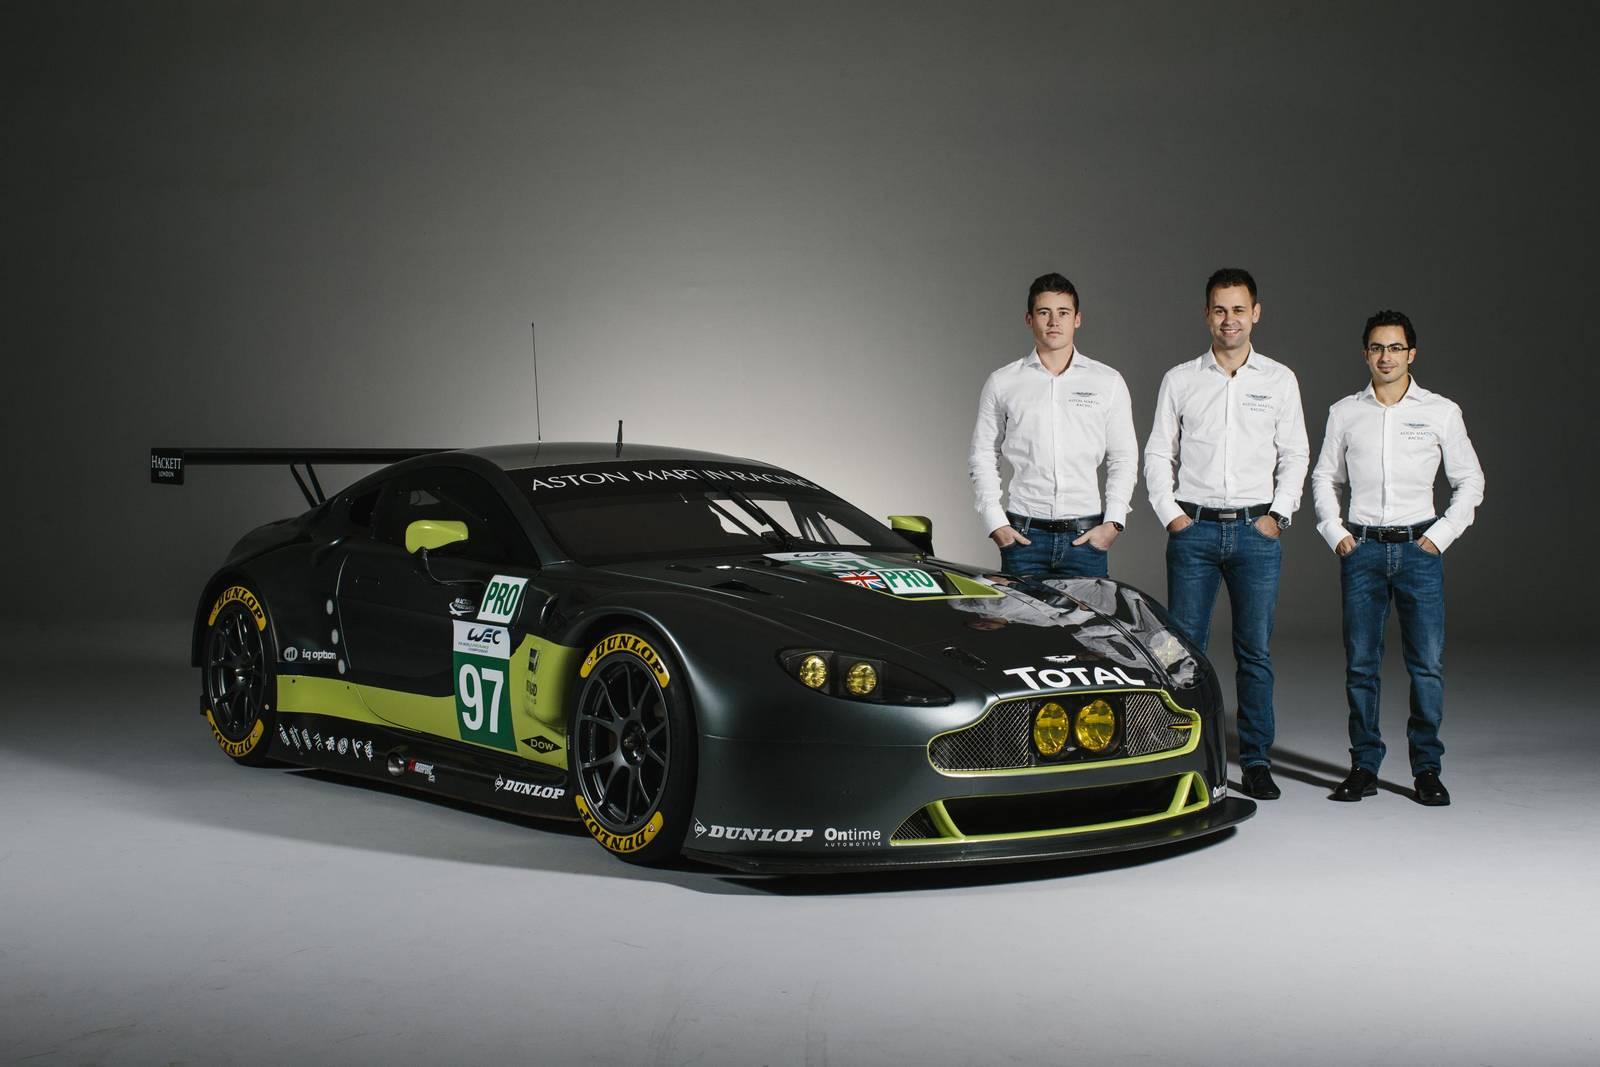 Official 2016 Aston Martin V8 Vantage Gte And V12 Vantage Gt3